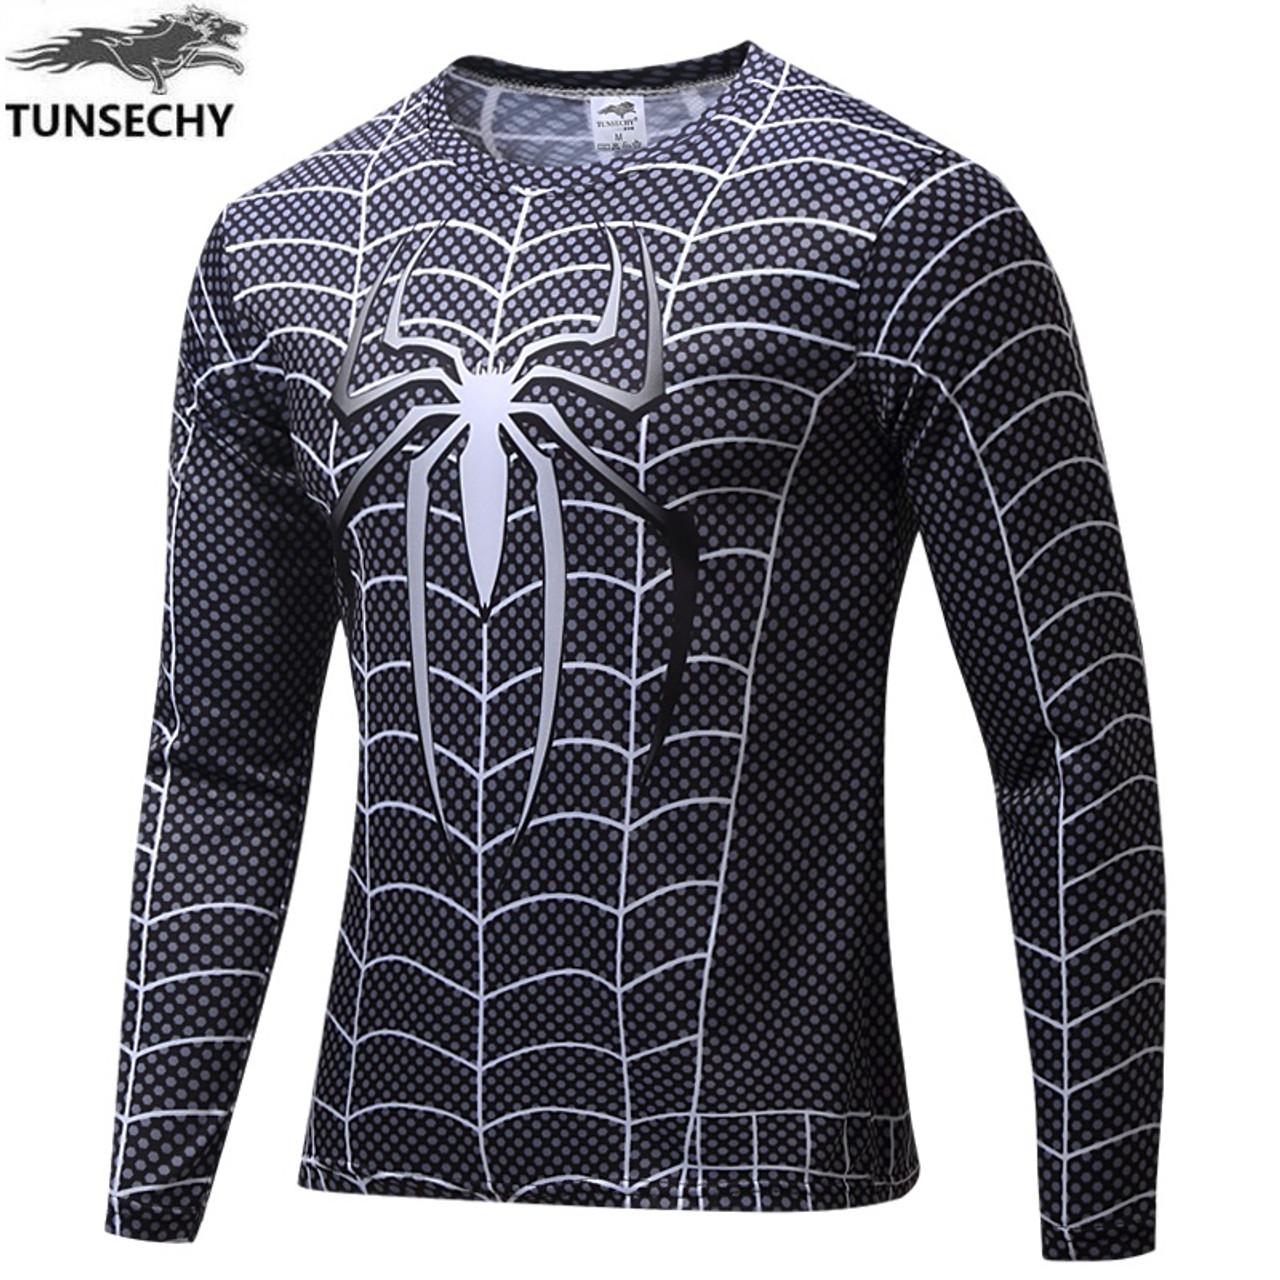 Super Superman Captain Heroes Spiderman Tunsechy Comics Brand Marvel qVUMSzp